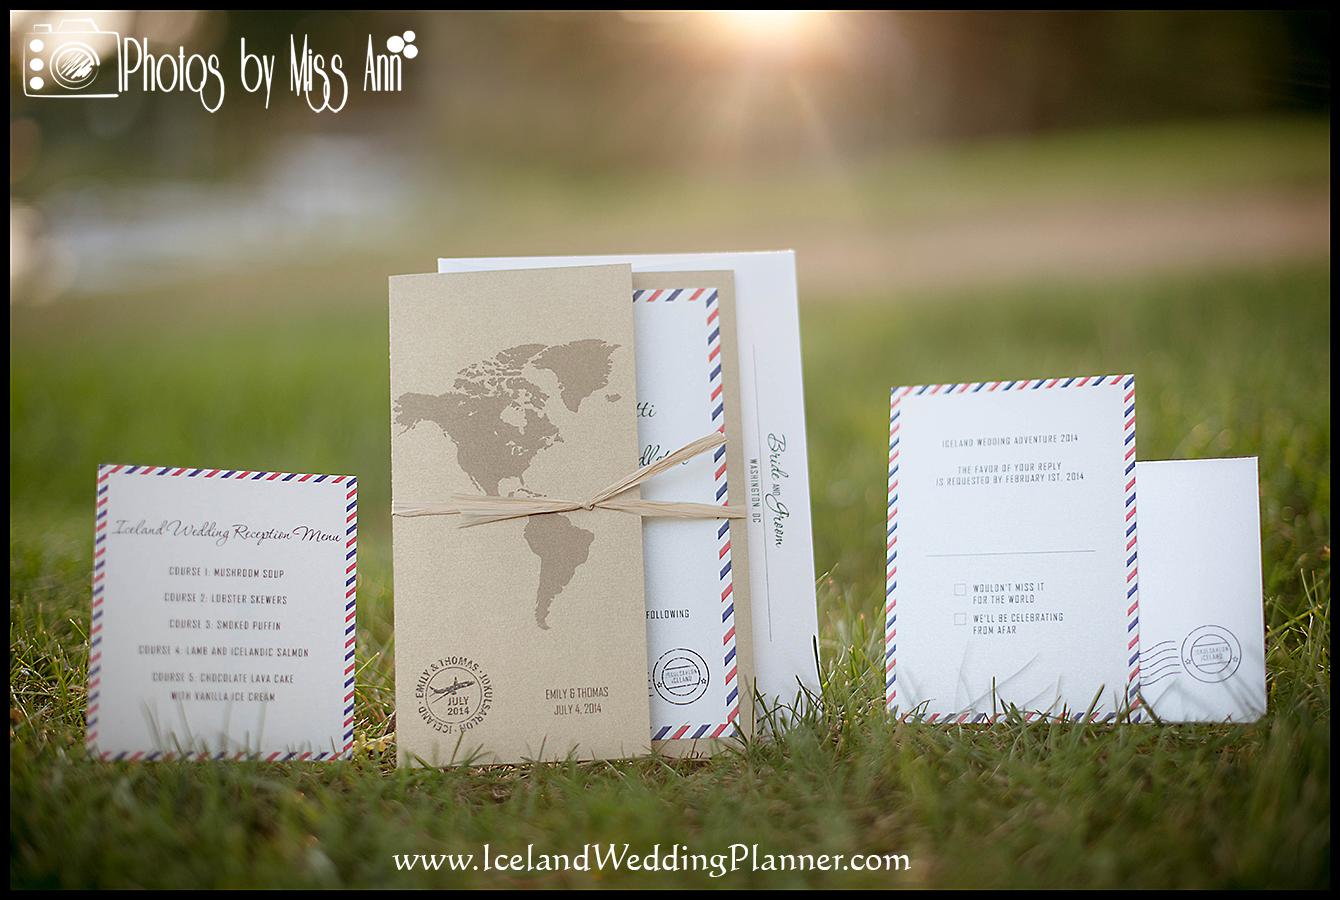 Iceland Wedding Planner Creative Destination Invitations For Weddings